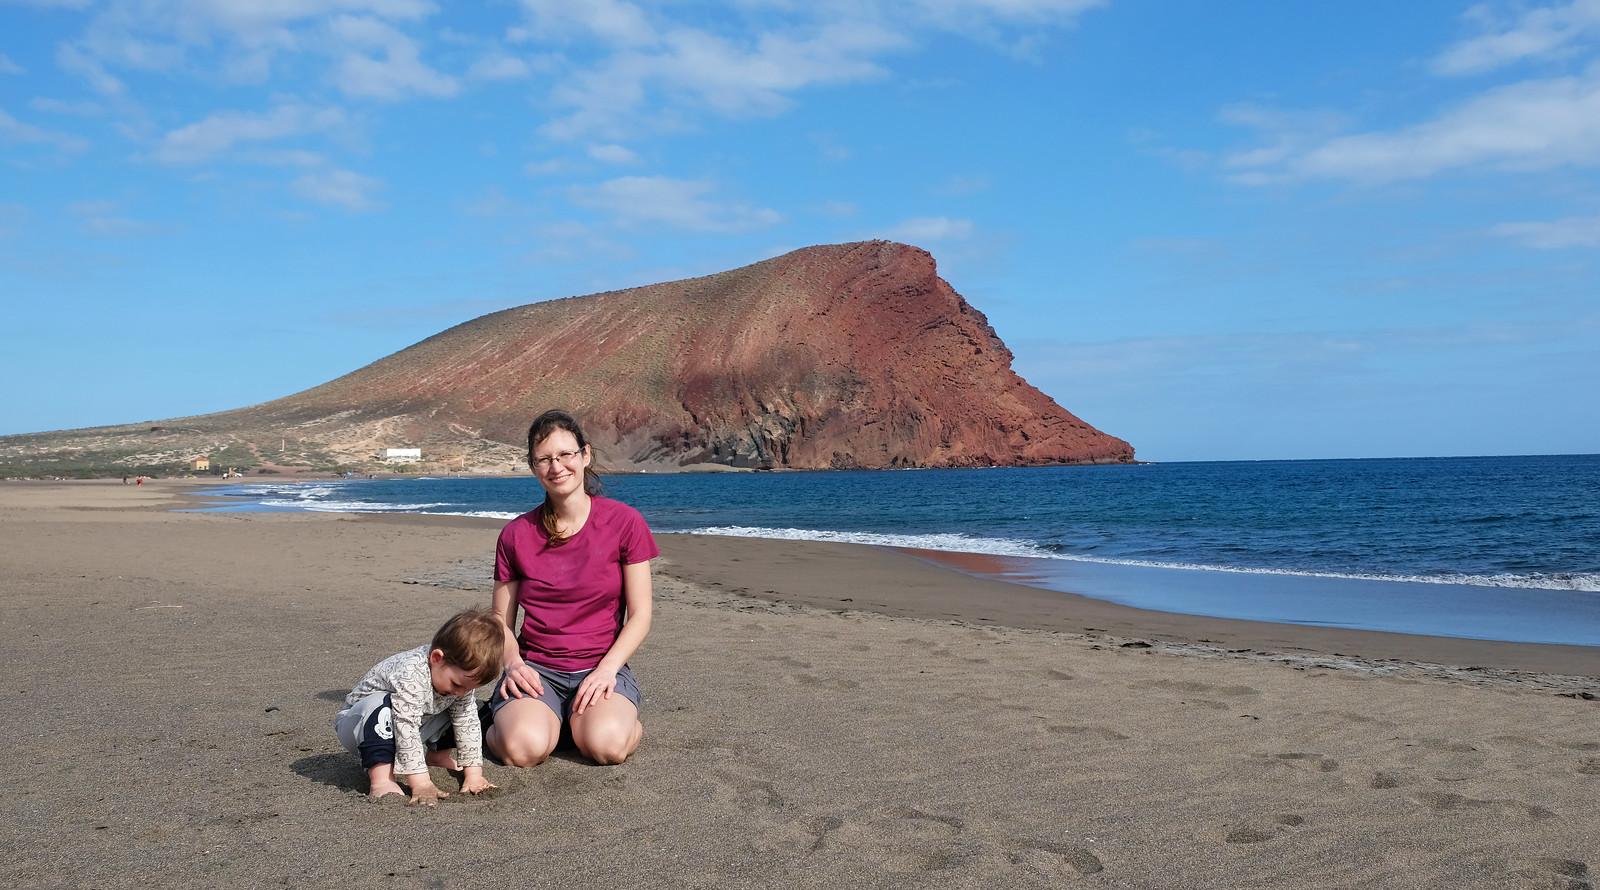 Playa de la Tejita, Tenerife, Canary Islands, Spain